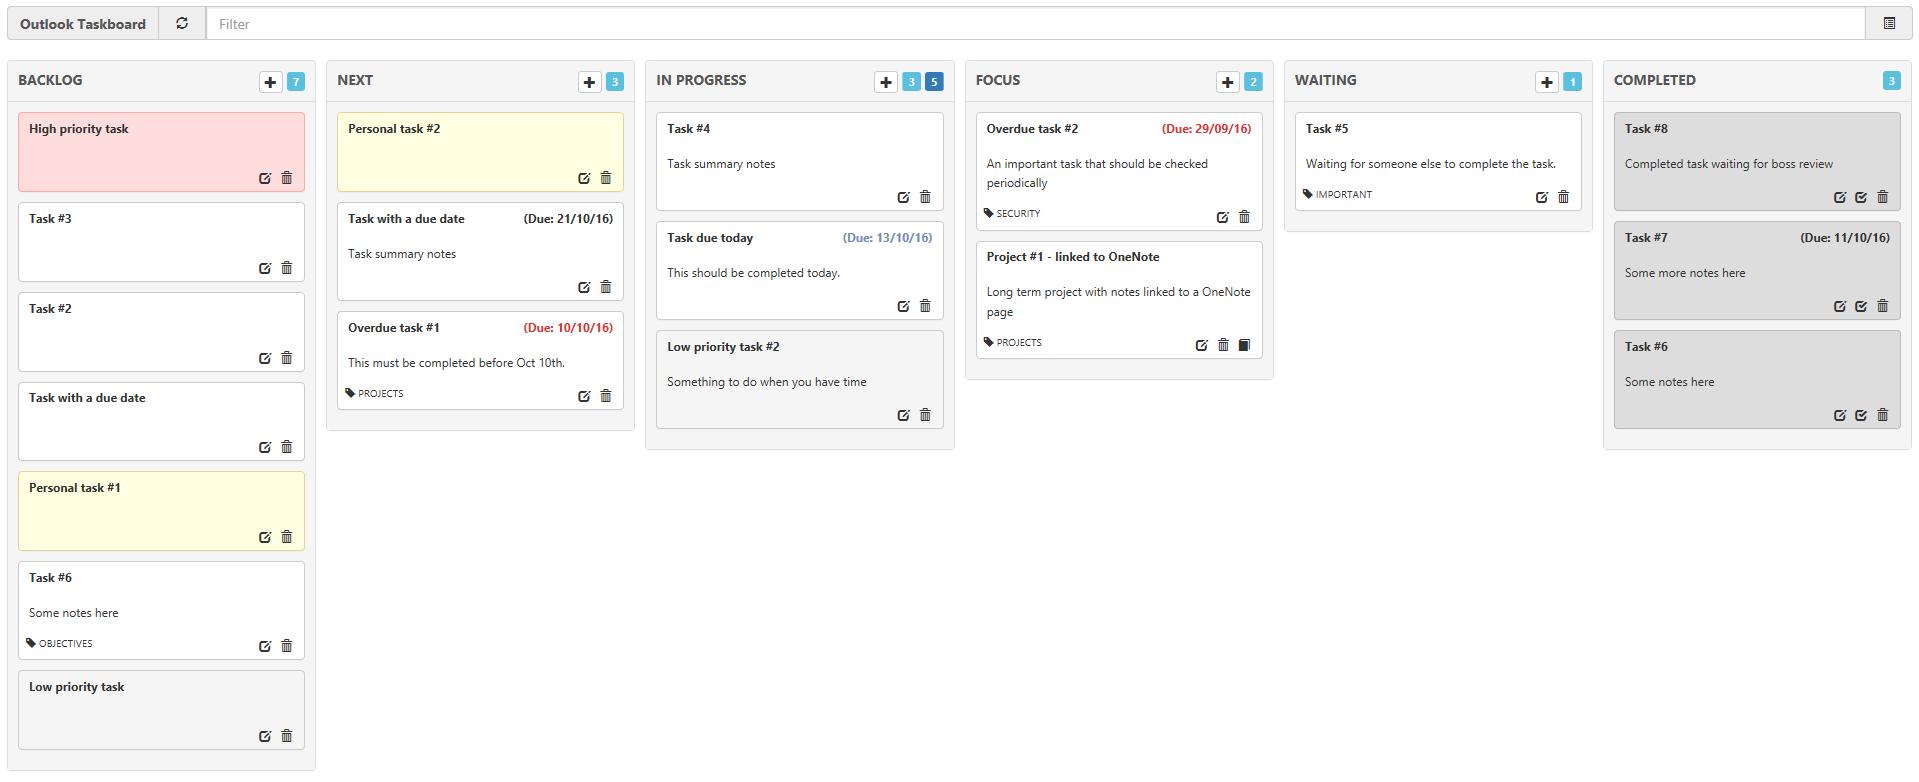 Outlook Taskboard